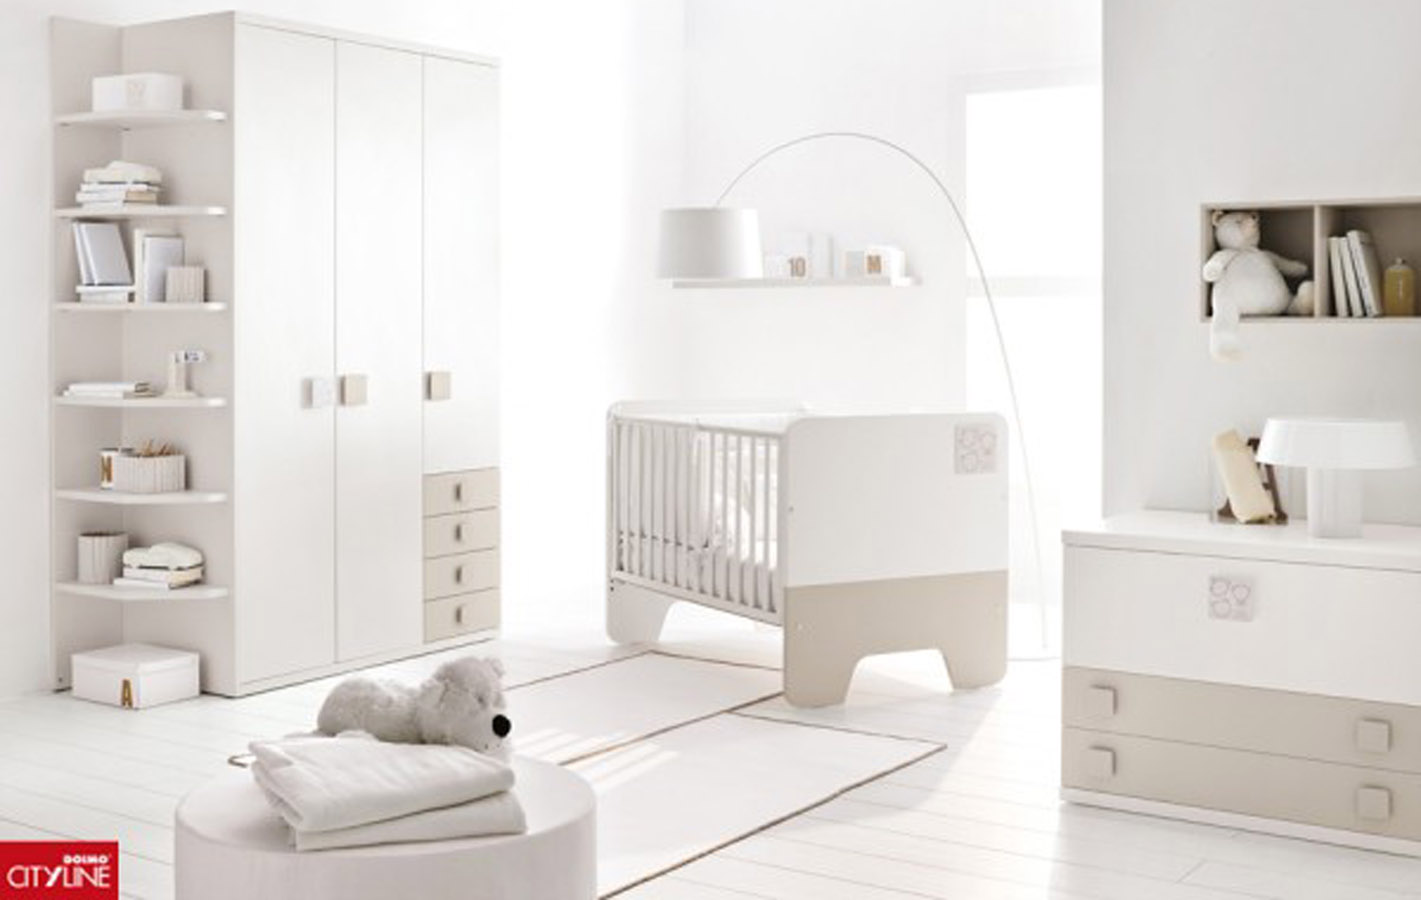 Camerette per bebè Doimocityline